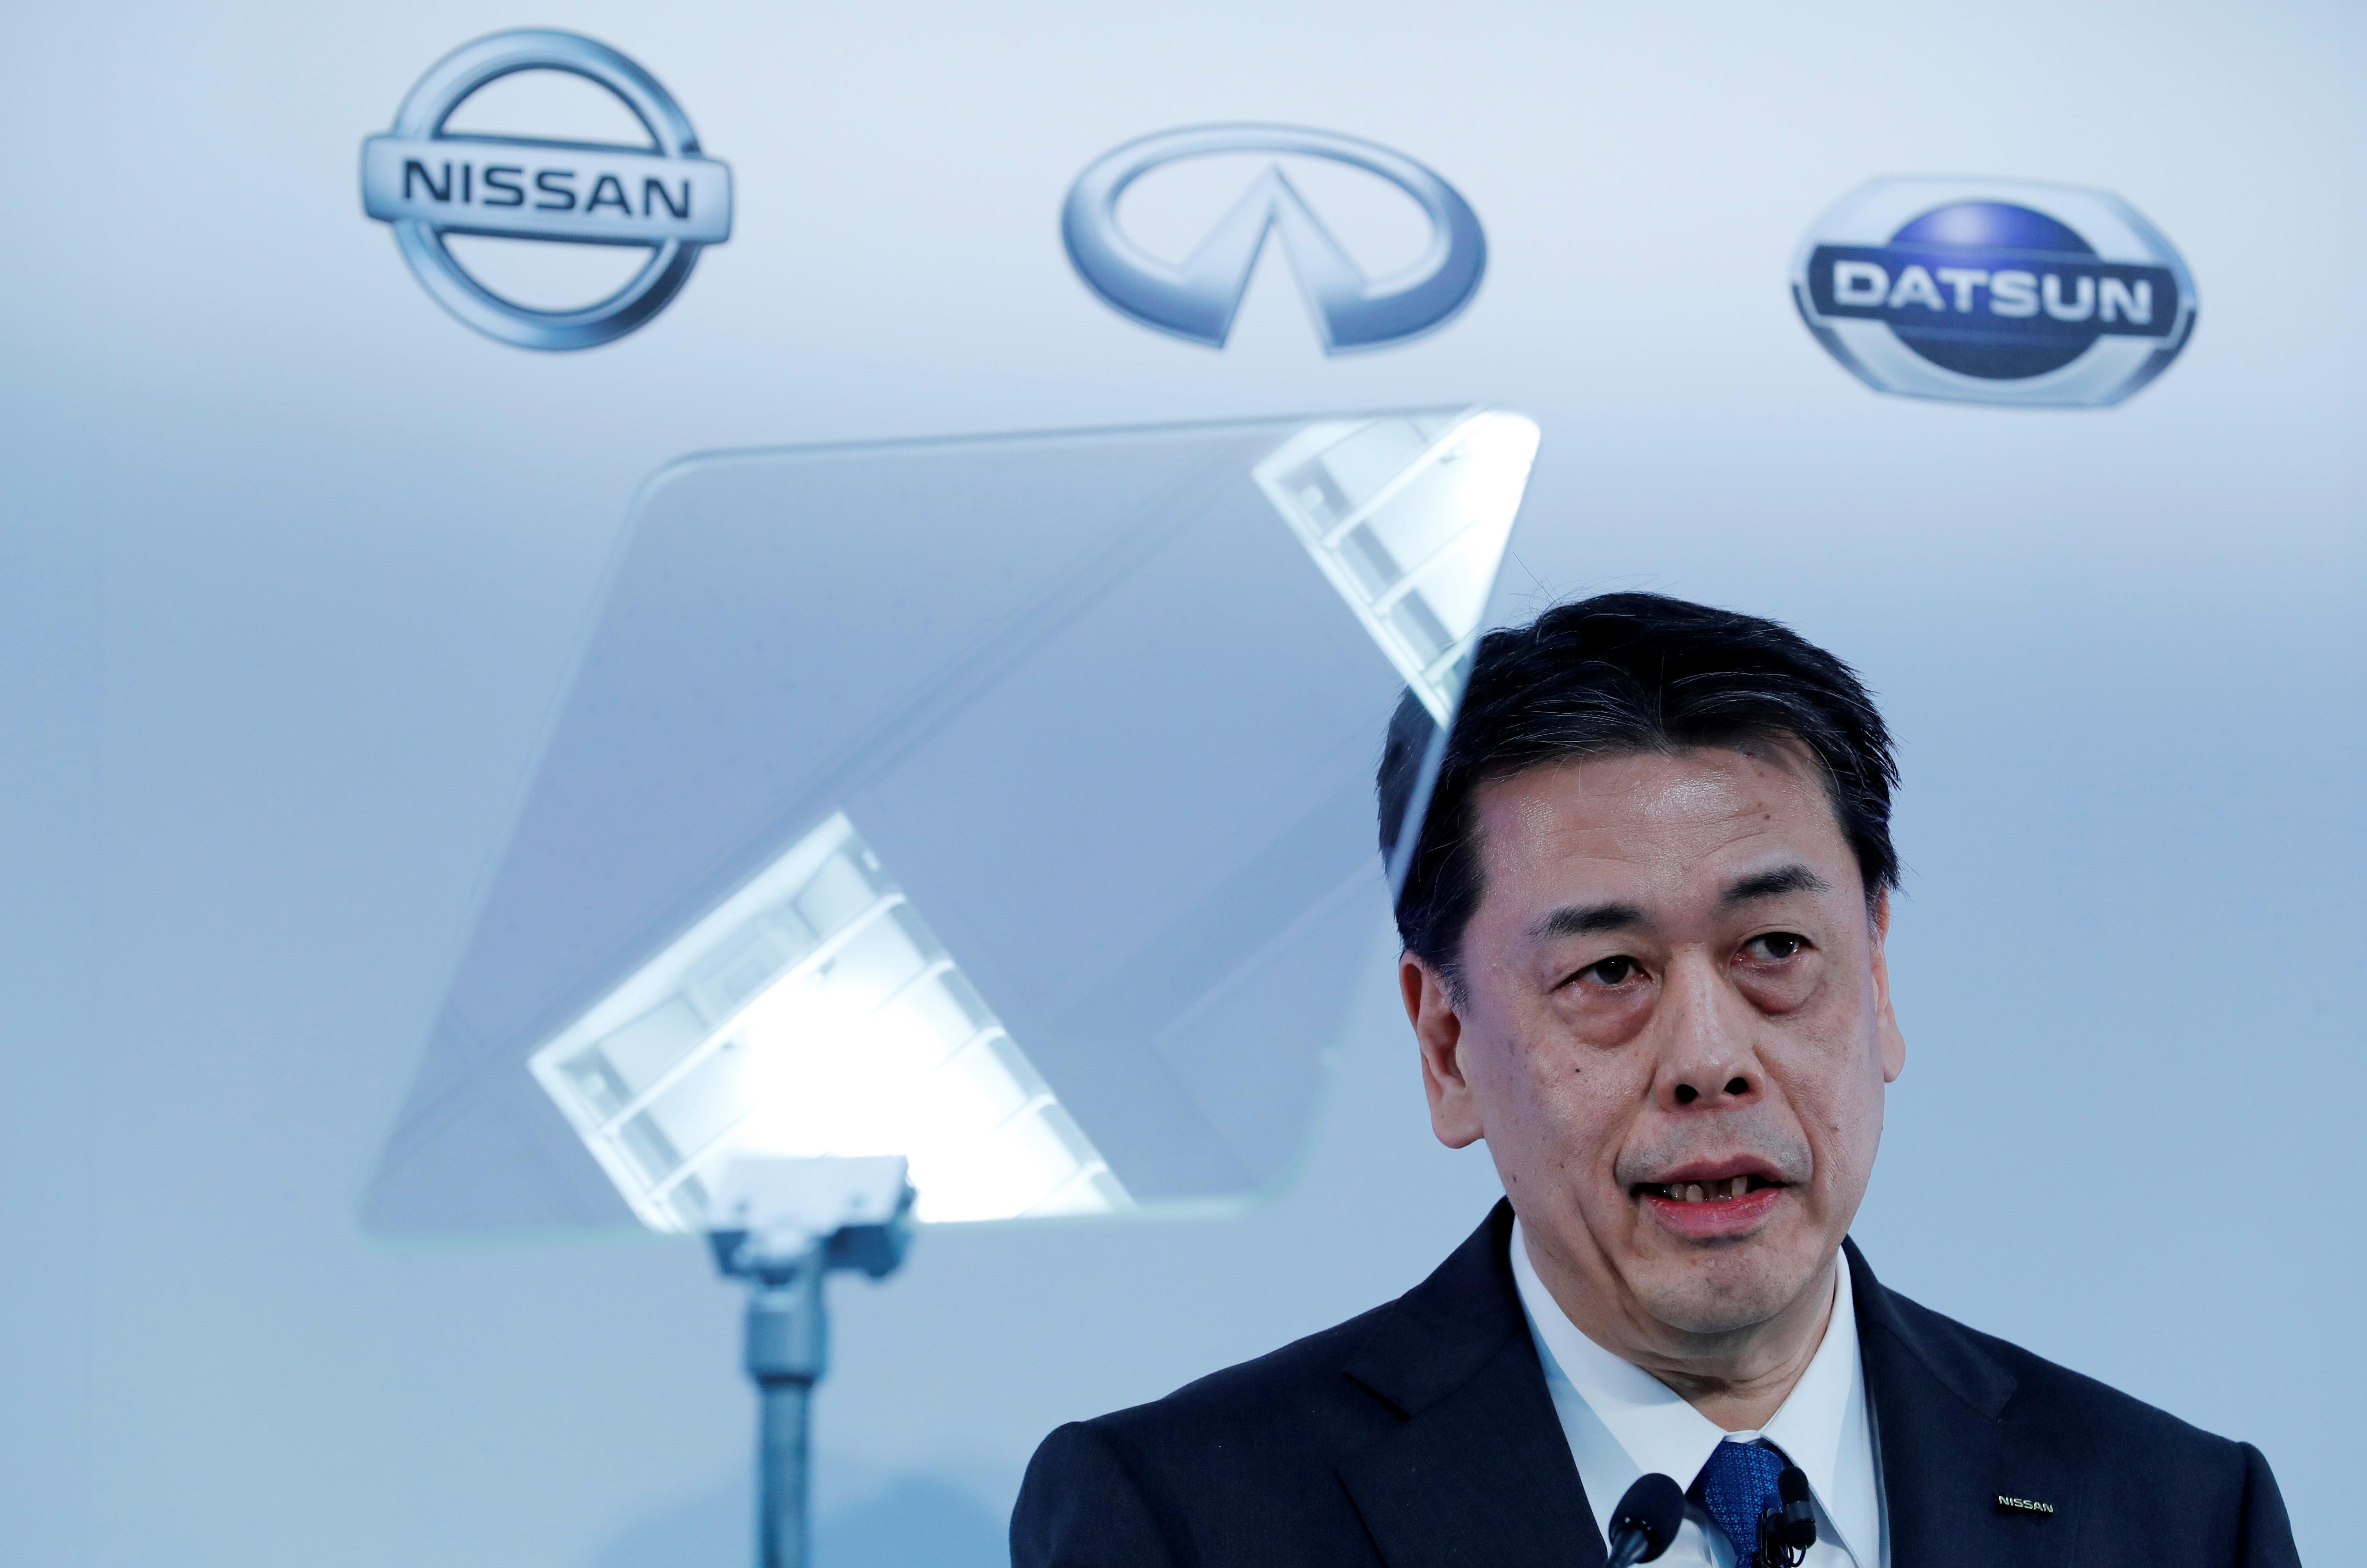 Nissan Motor Co CEO Makoto Uchida speaks during a news conference at the company's headquarters in Yokohama, Japan February 13, 2020. REUTERS/Kim Kyung-Hoon